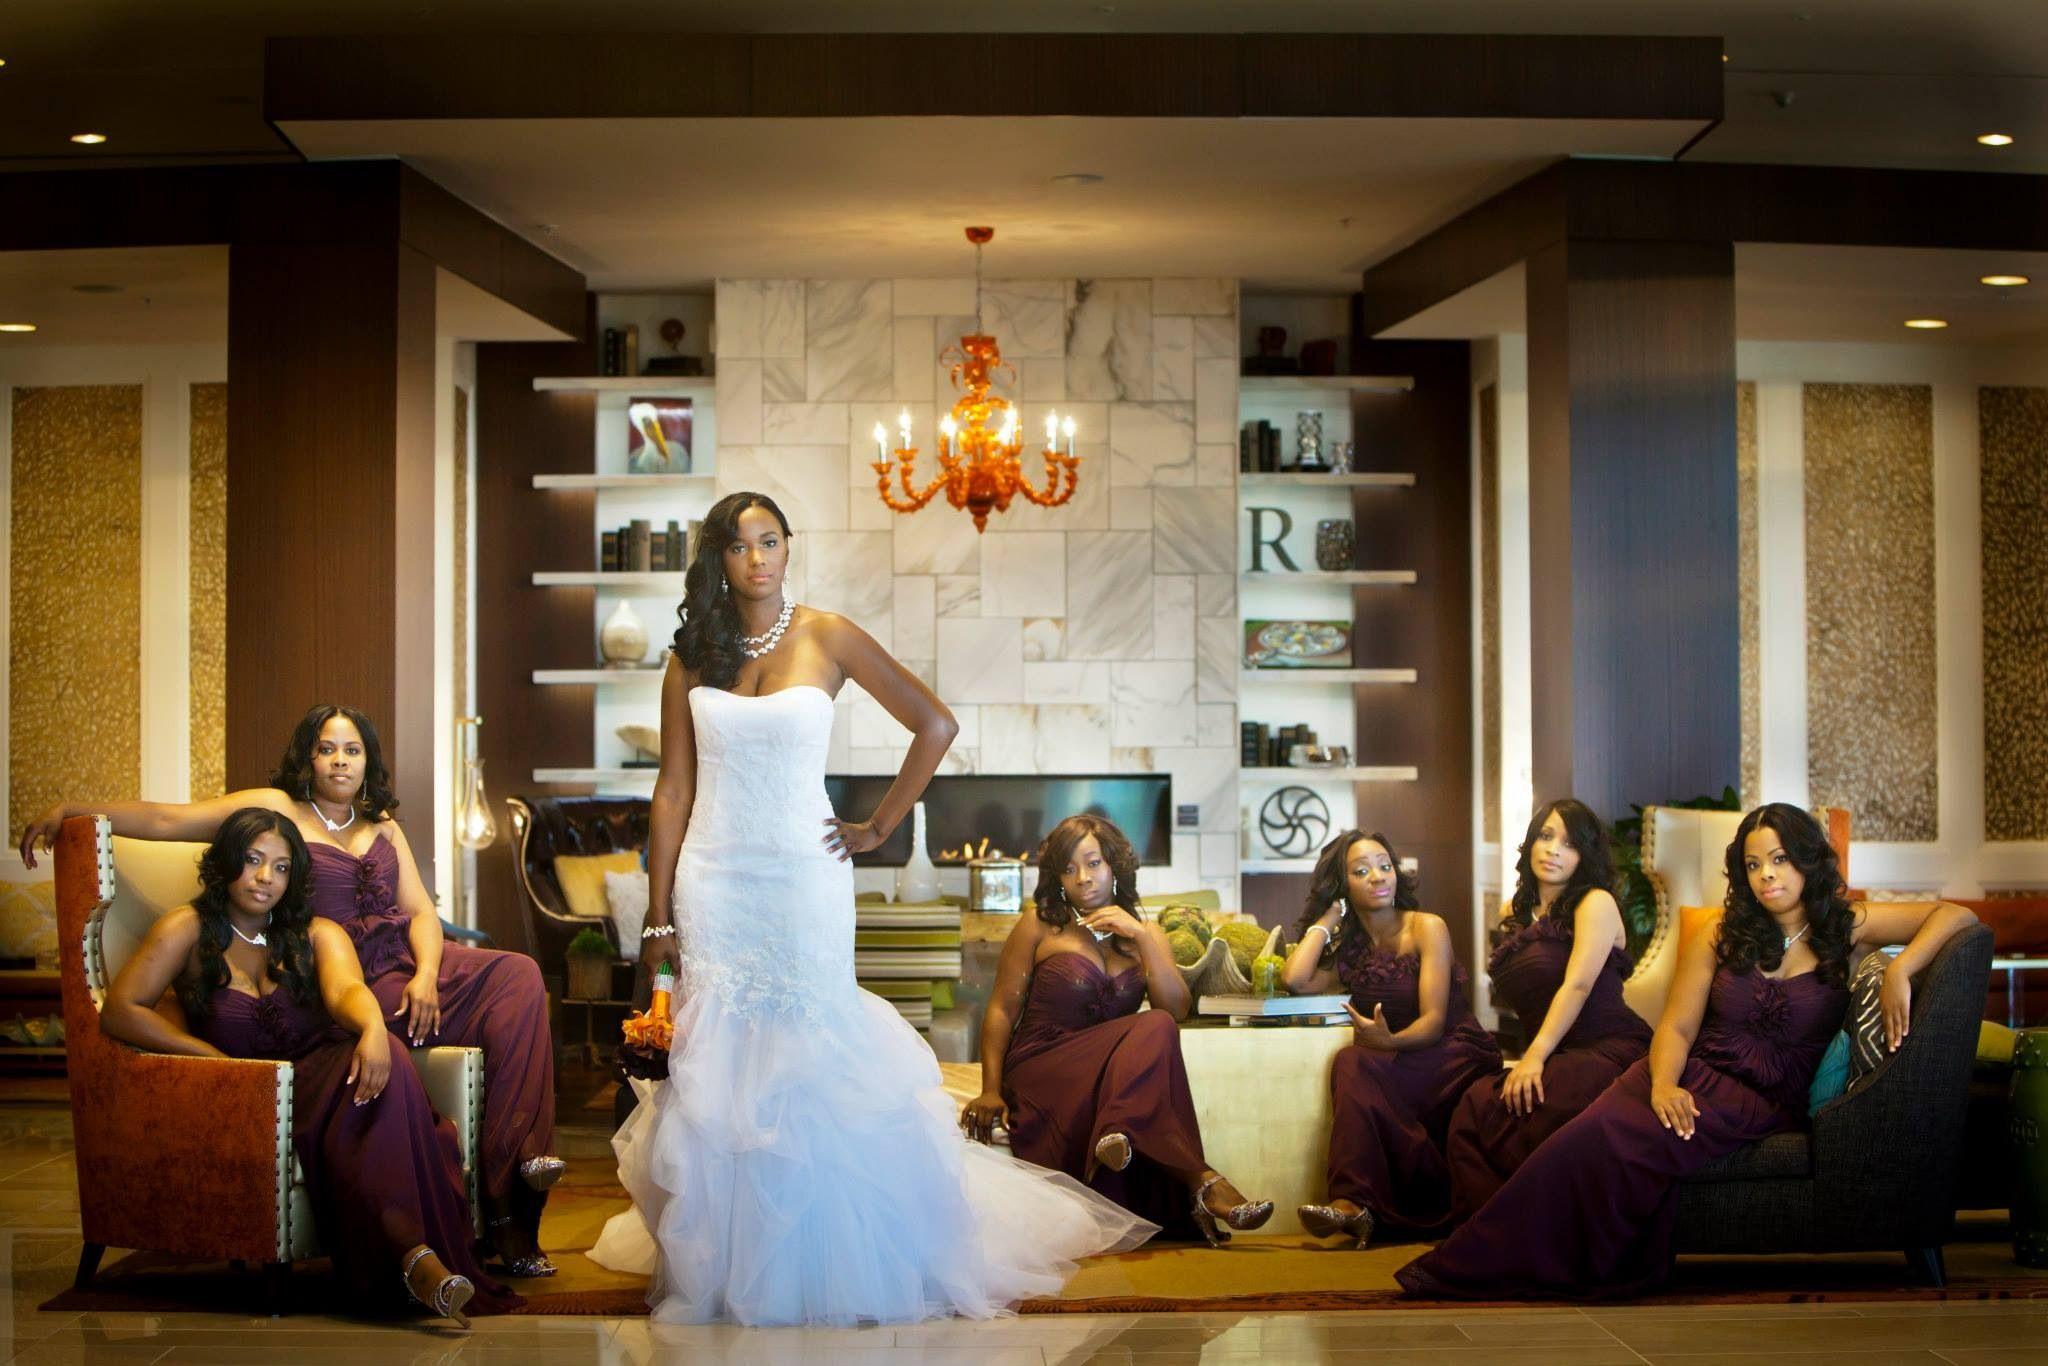 Renaissance Hotel Baton Rouge La Mermaid Formal Dress Renaissance Hotel Formal Dresses [ 1366 x 2048 Pixel ]